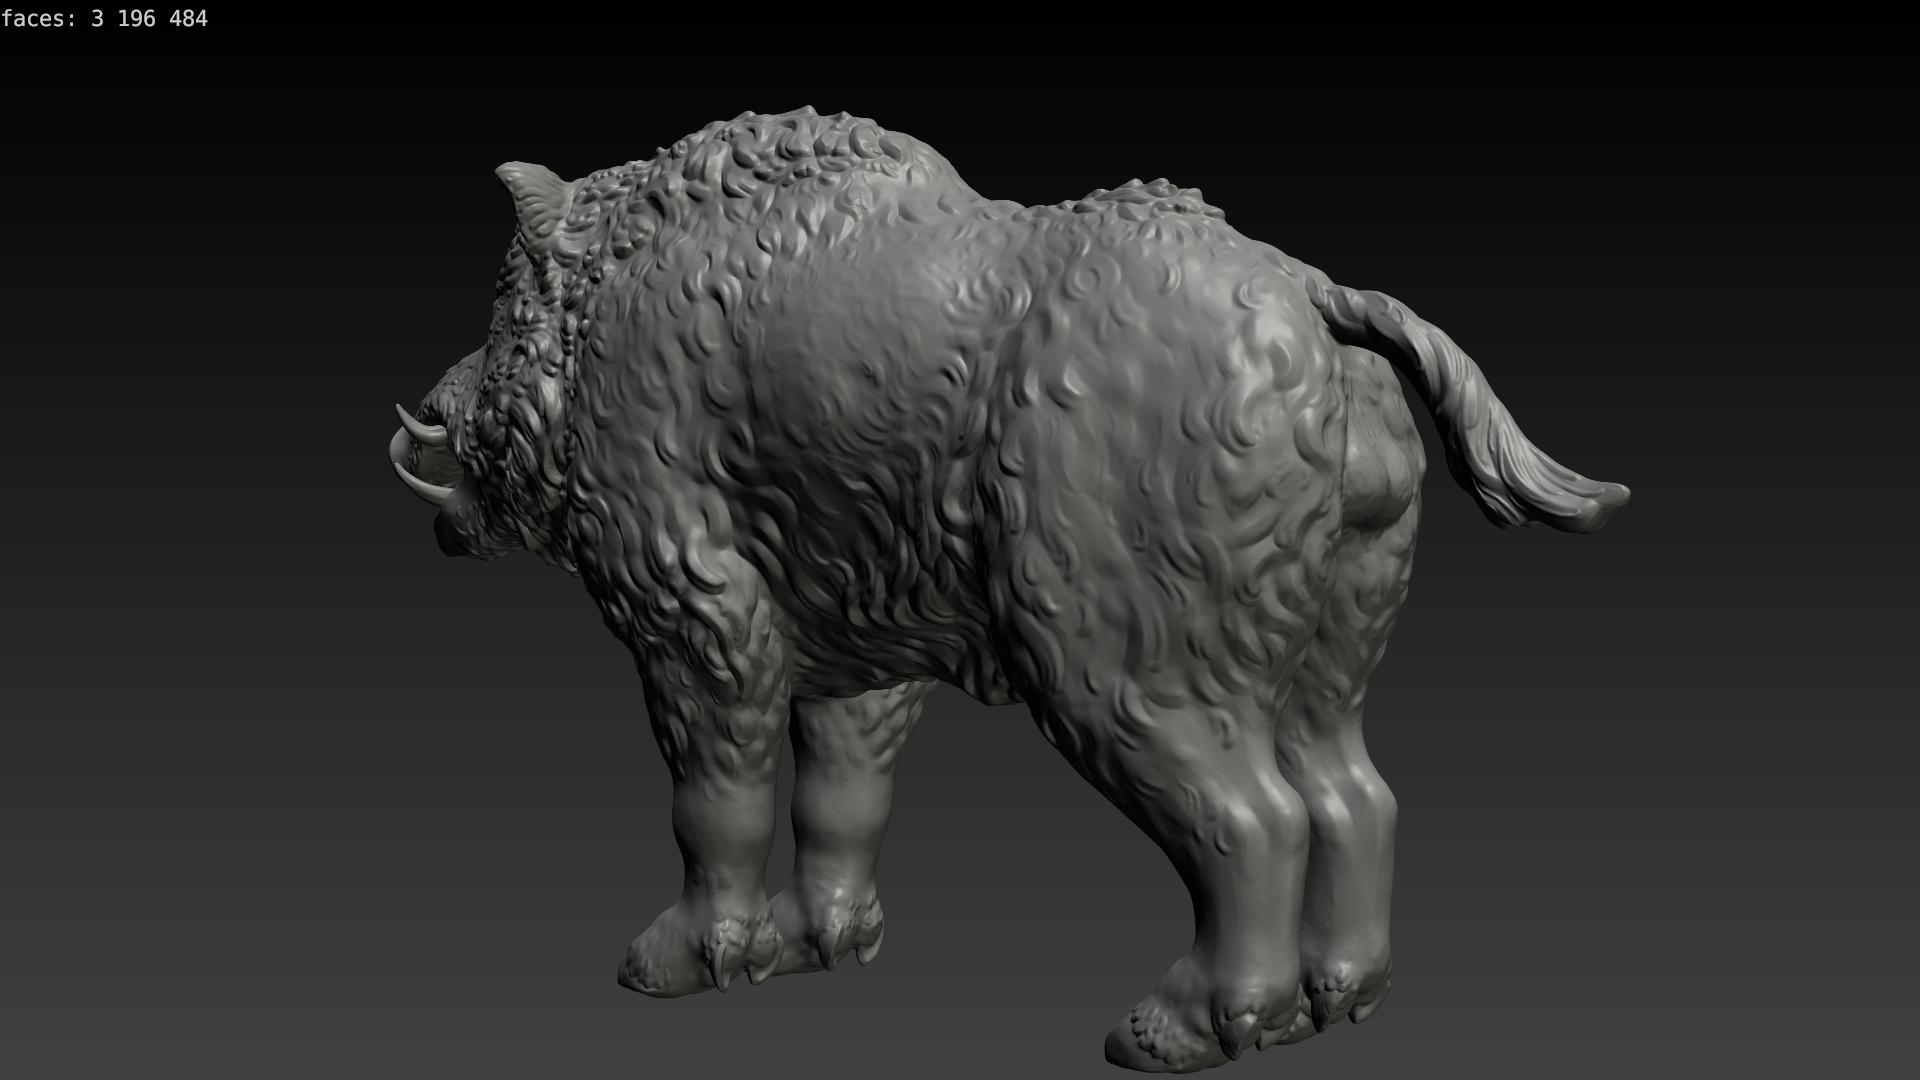 boar-03.png Download STL file Boar • 3D printable design, Skazok